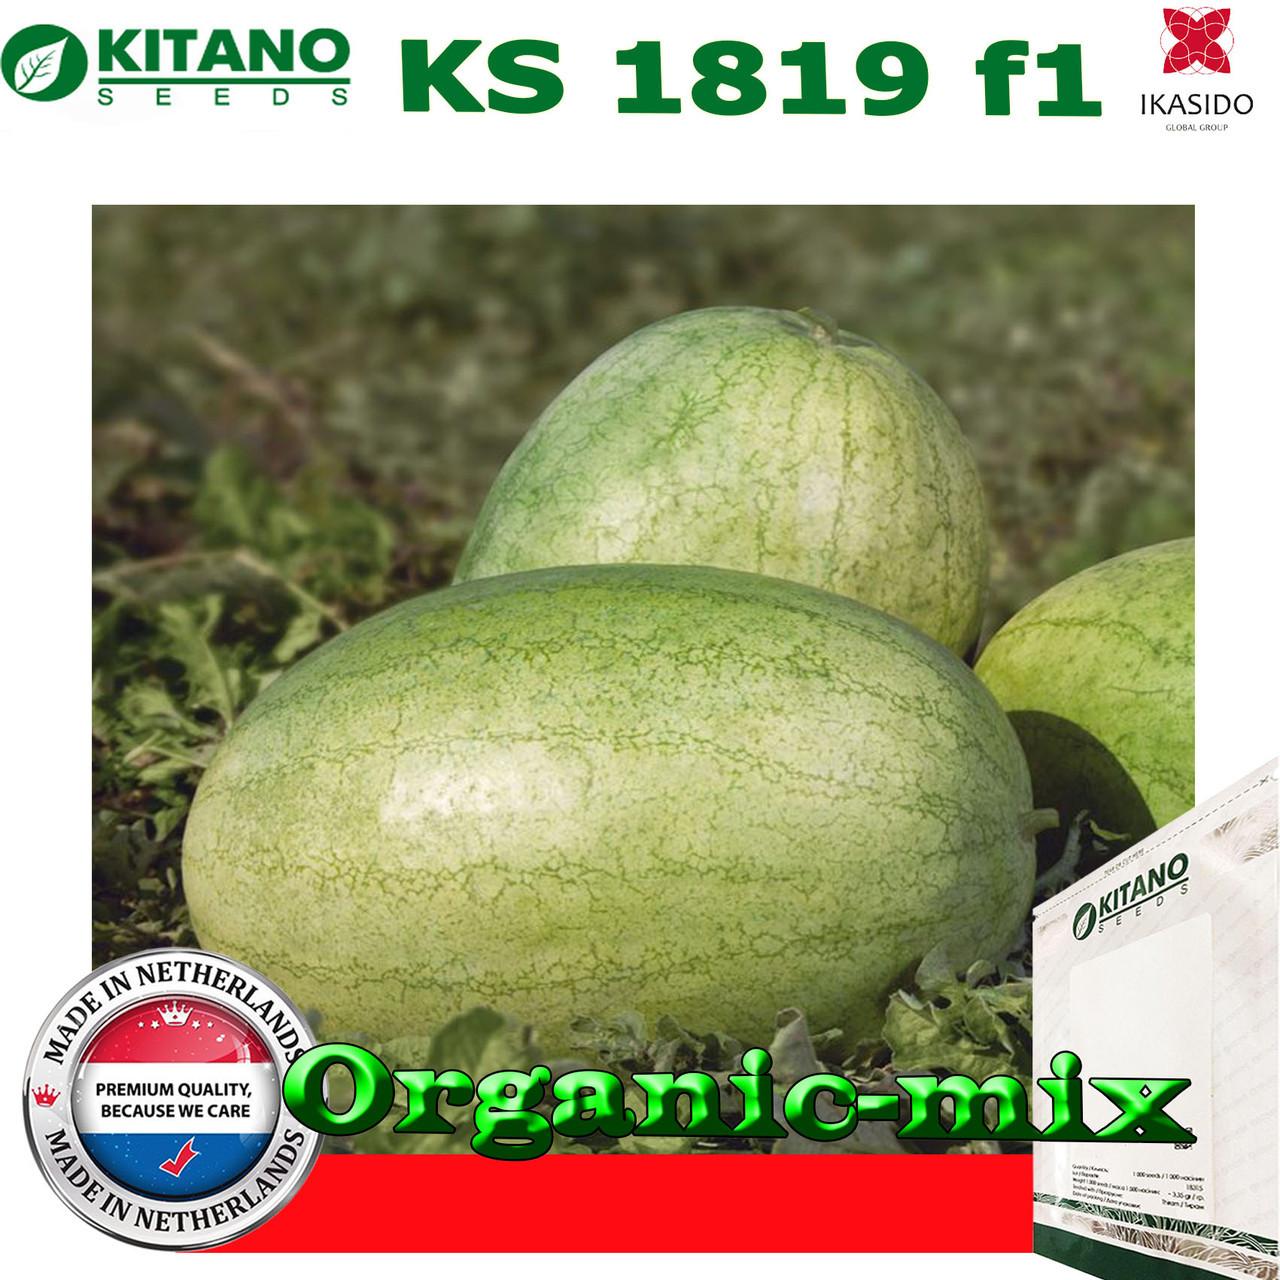 Семена, арбуз КS 1819 F1, 100 семян, KITANO SEEDS (Нидерланды)